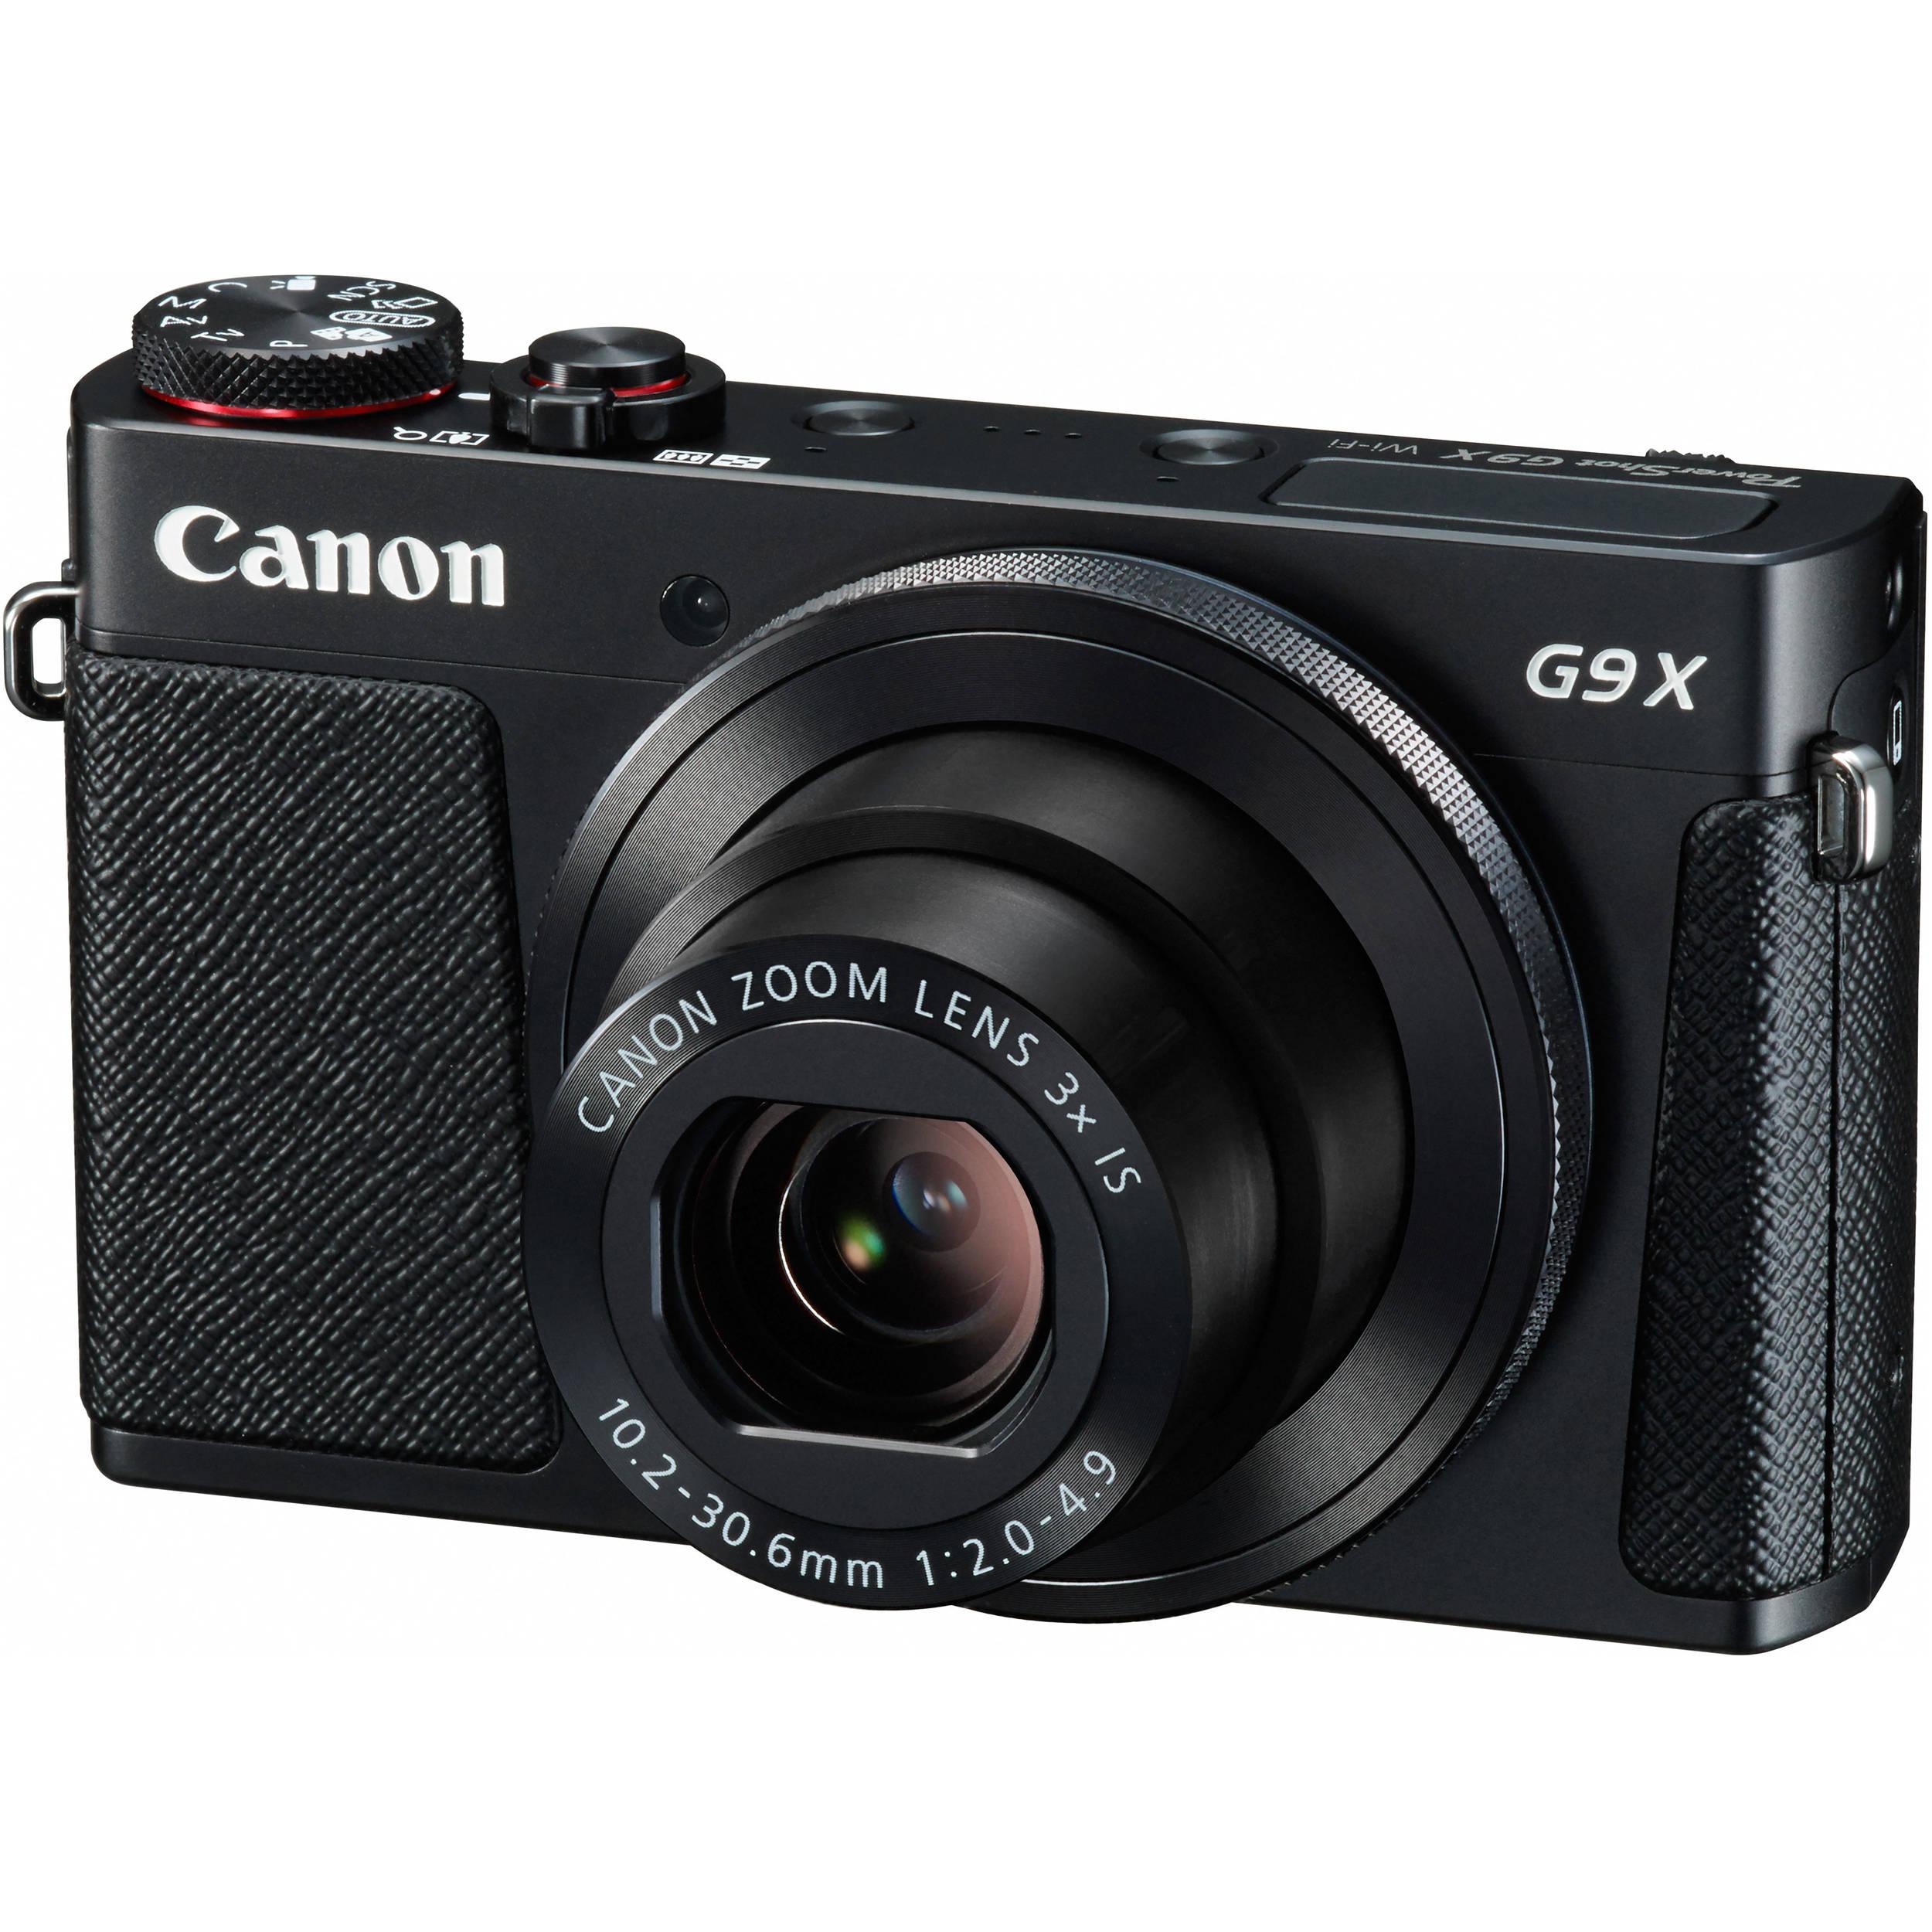 Canon PowerShot G9 X Digital Camera (Black) 0511C001 B&H Photo